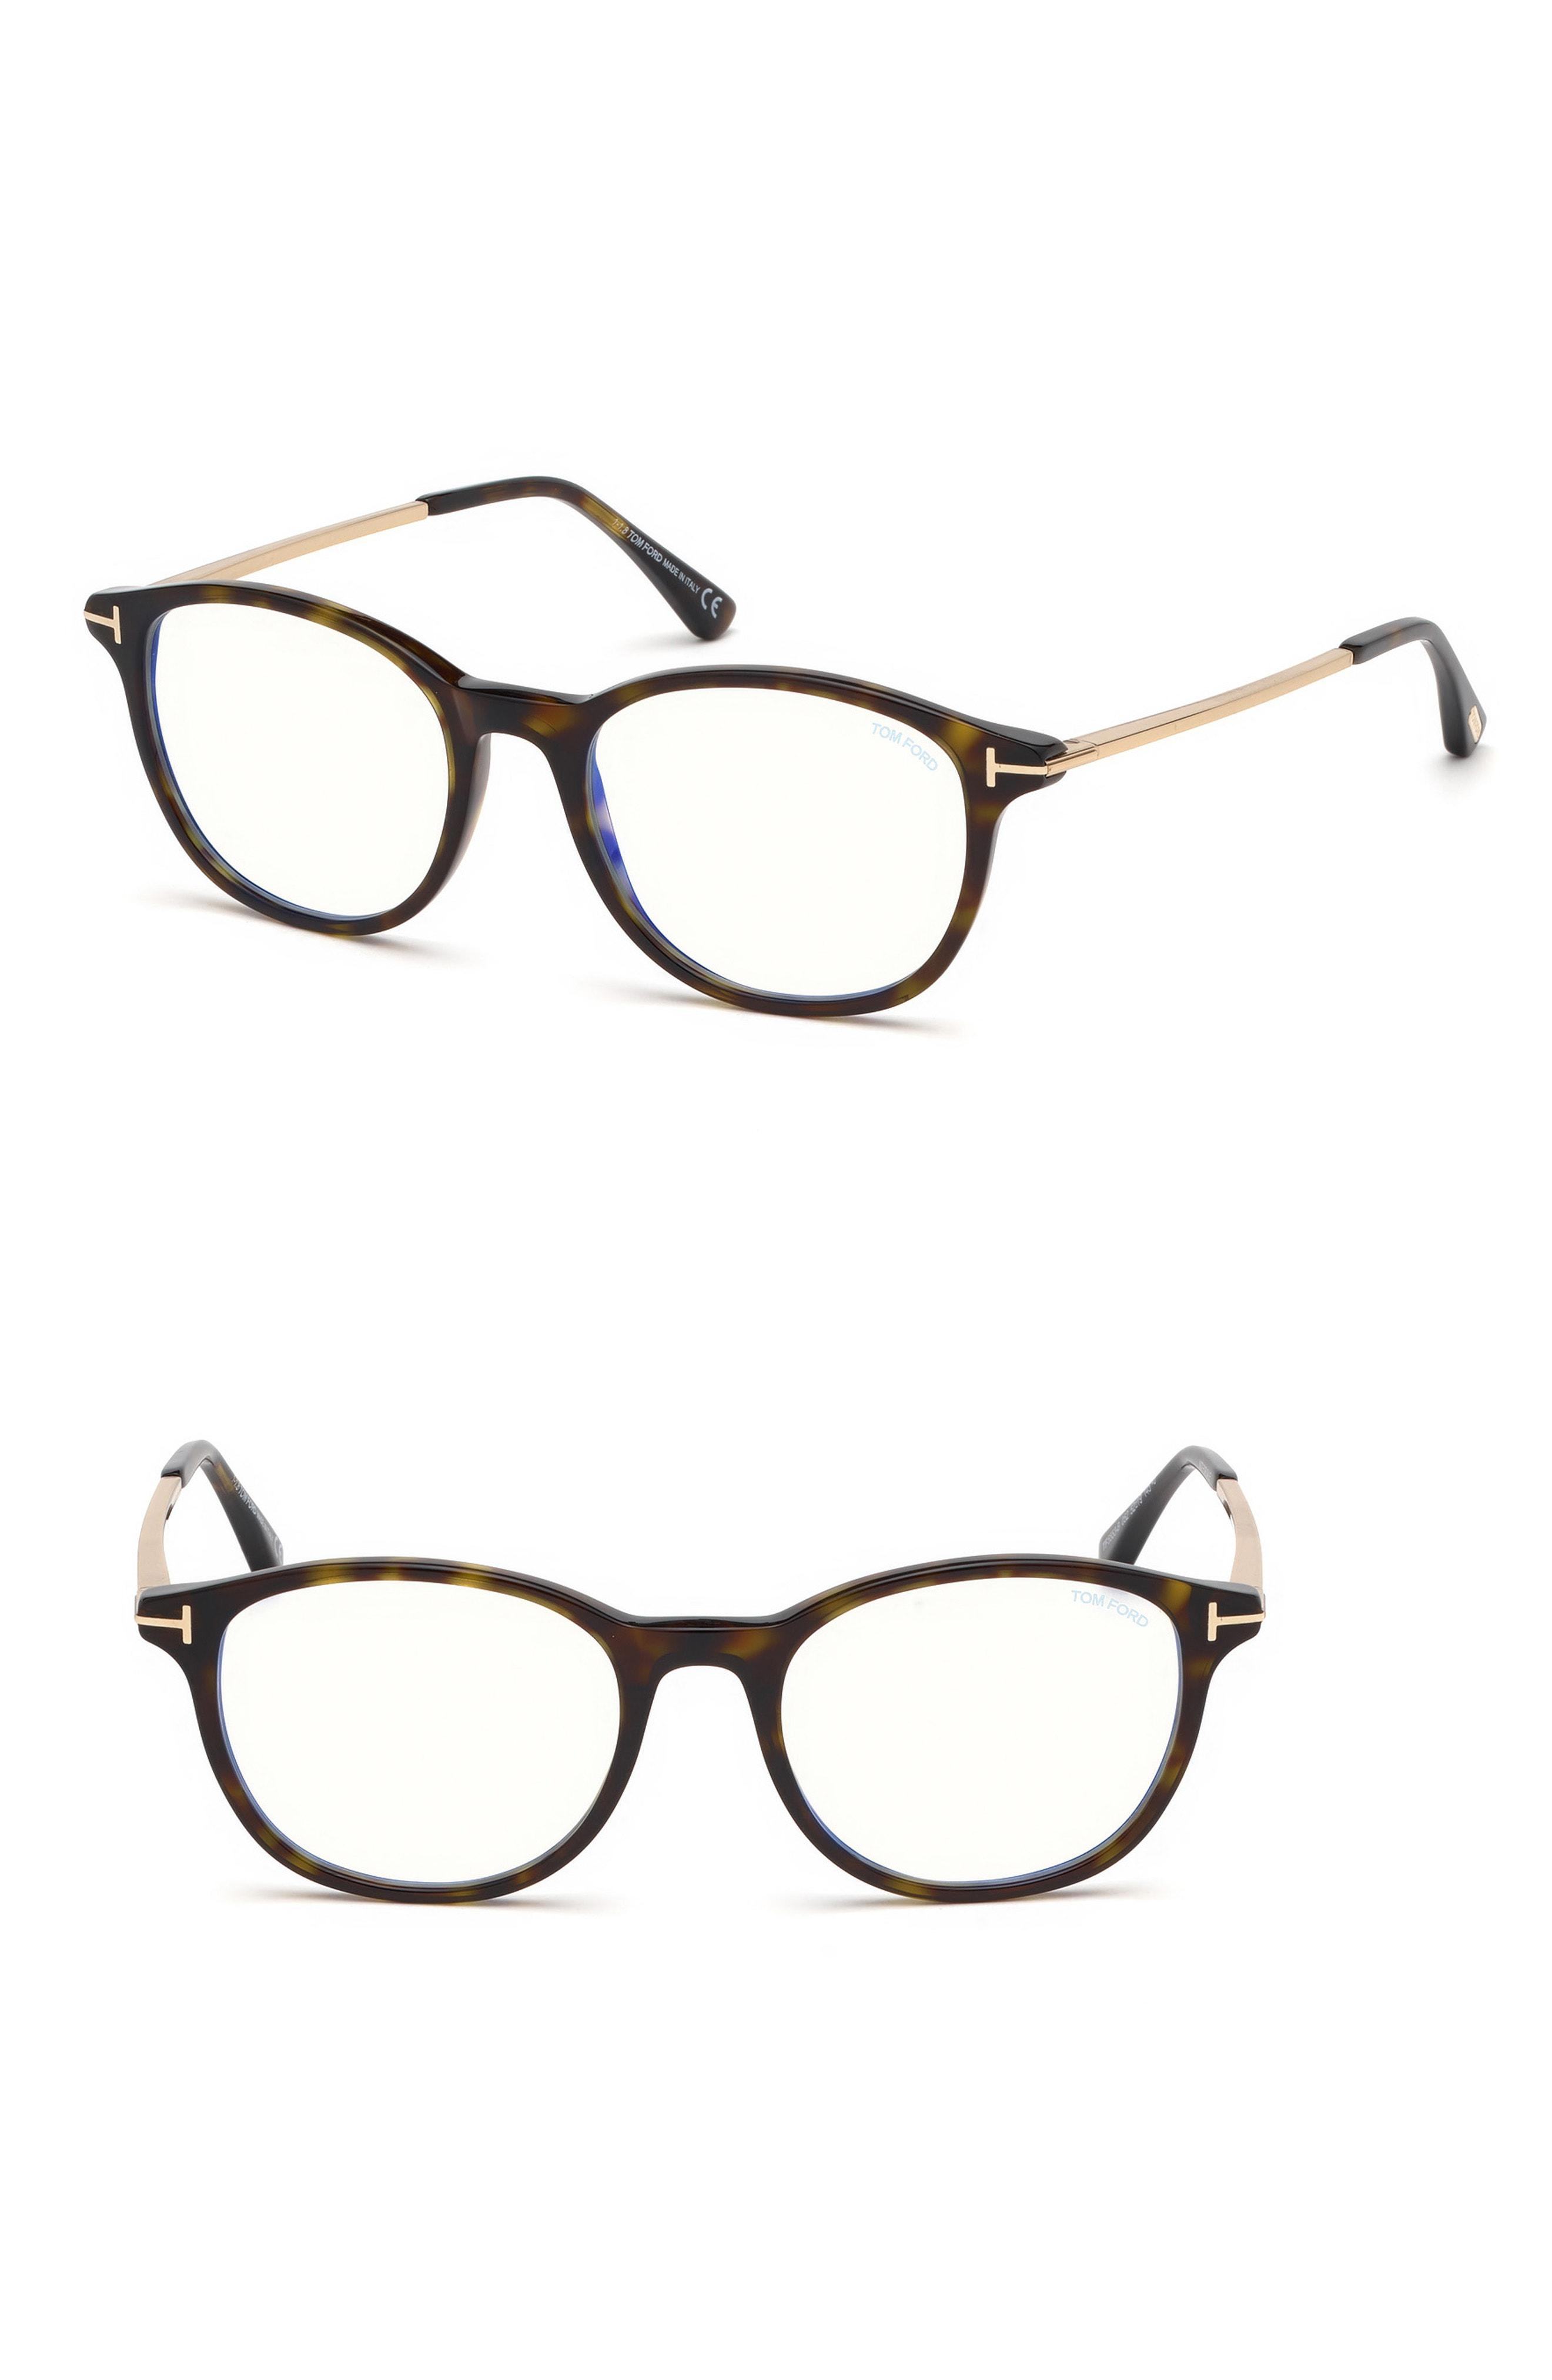 692a27bb8a Tom Ford - 50mm Blue Light Blocking Glasses - Shiny Dark Havana  Blue Block  for. View fullscreen